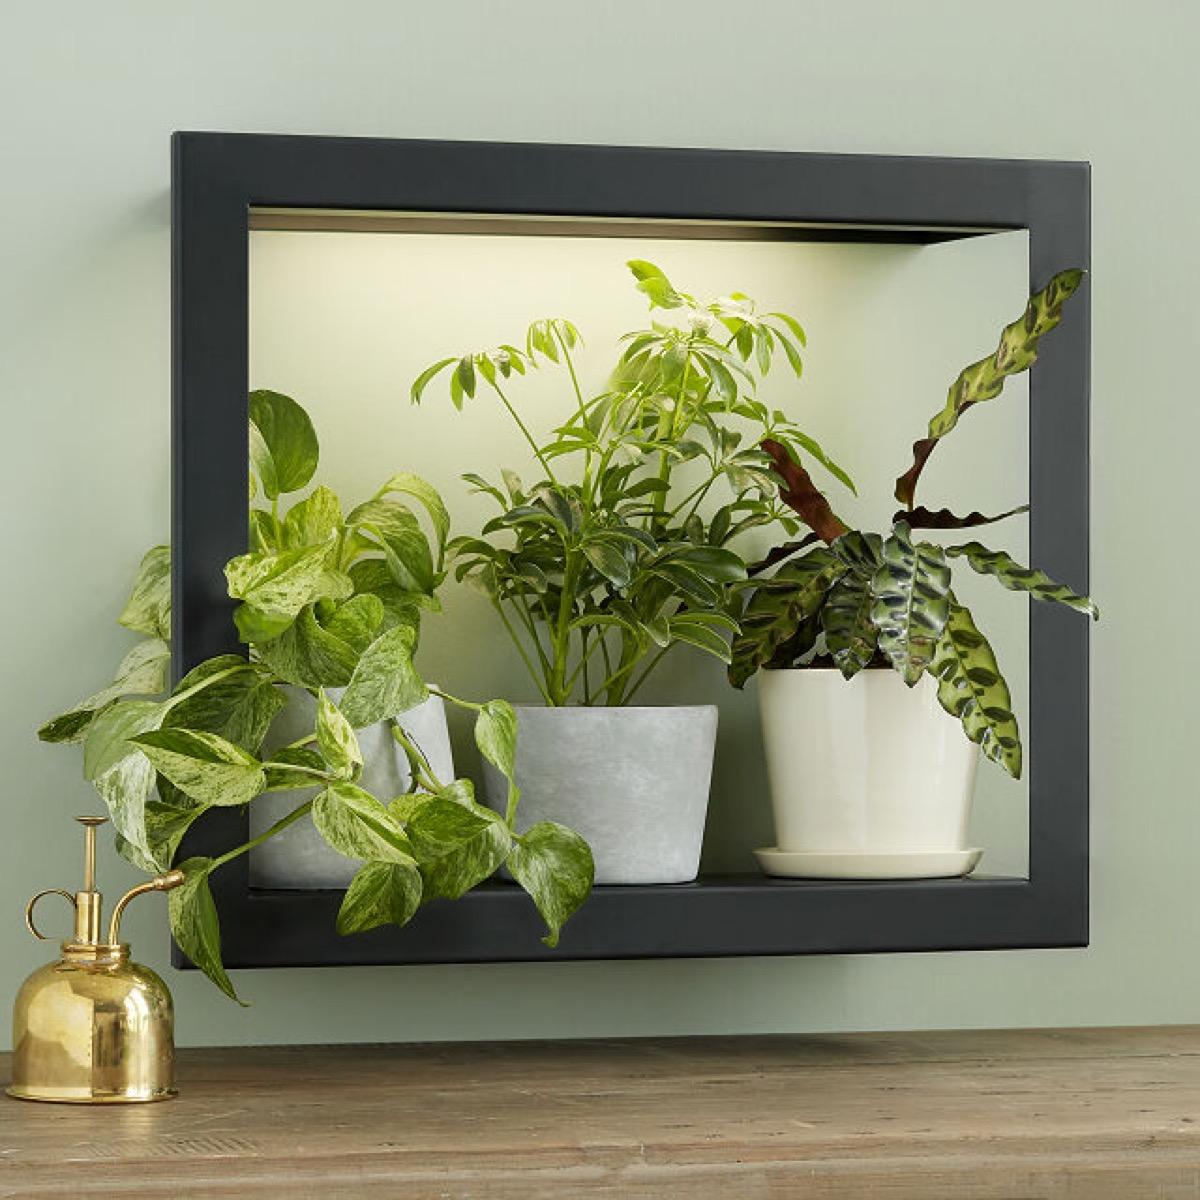 Plants in a modern grow frame